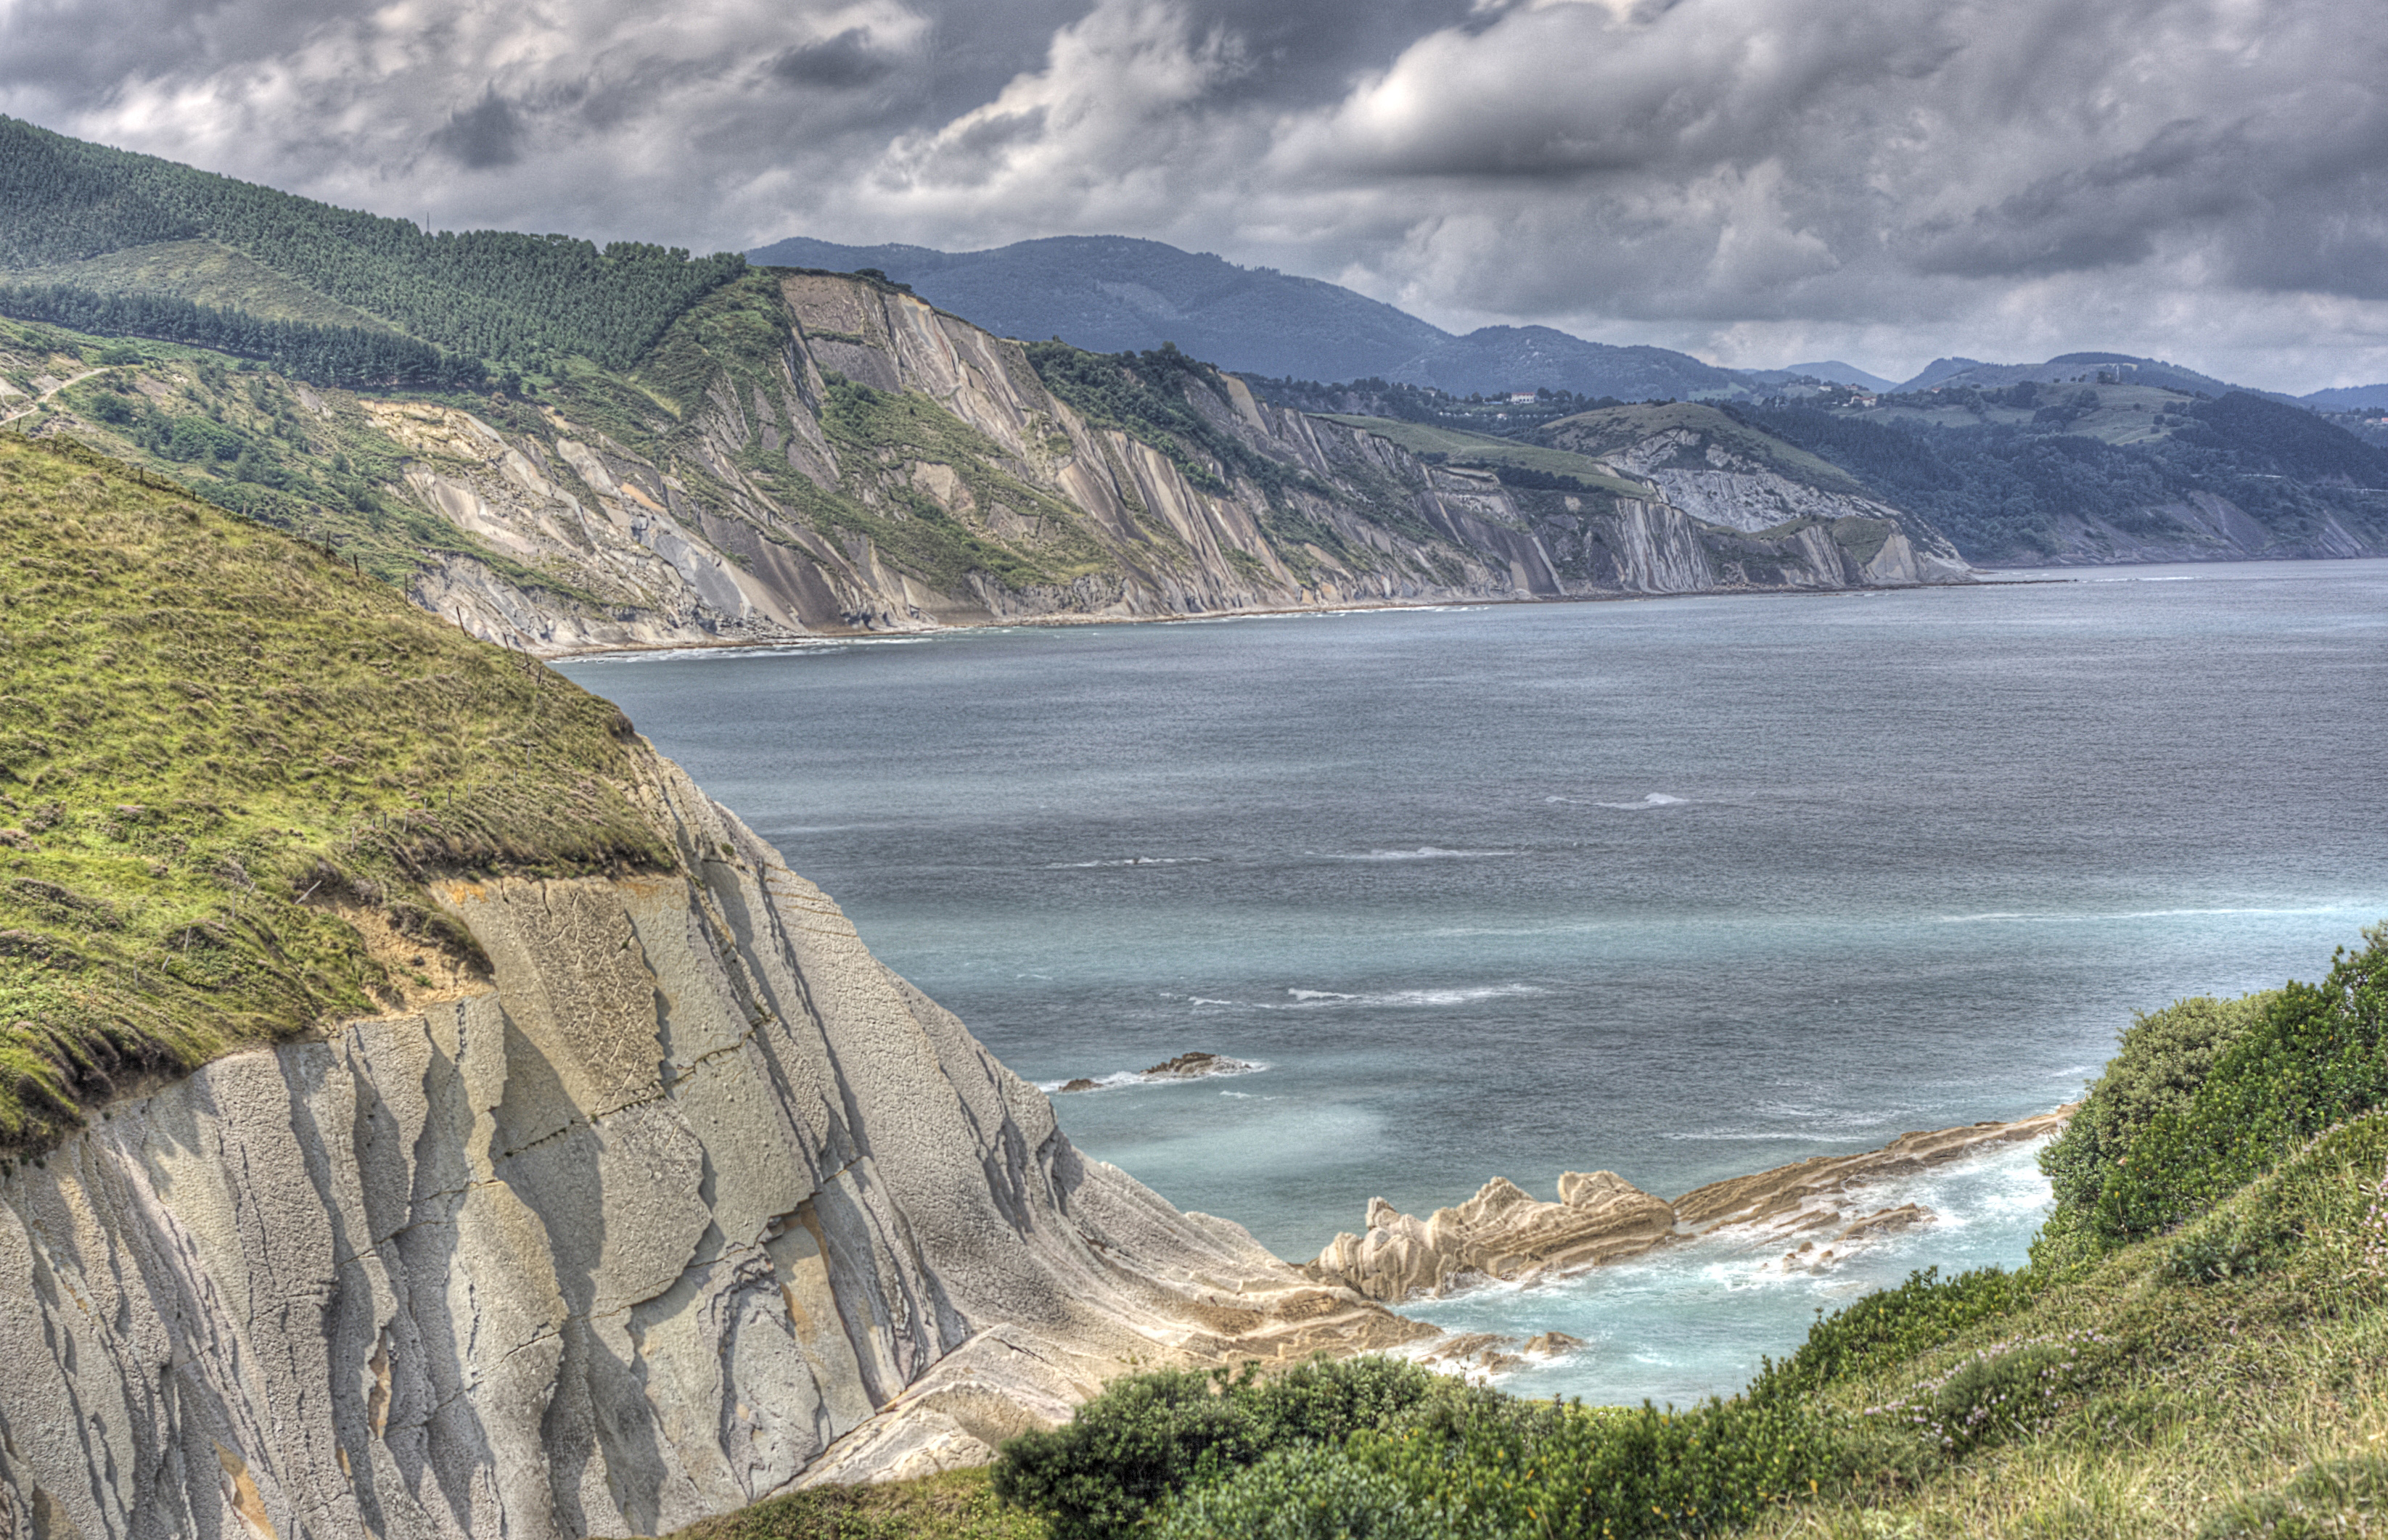 Bidegoian Spain  city images : sea costa rock coast geology karst basque sedimentary hdr euskal ...